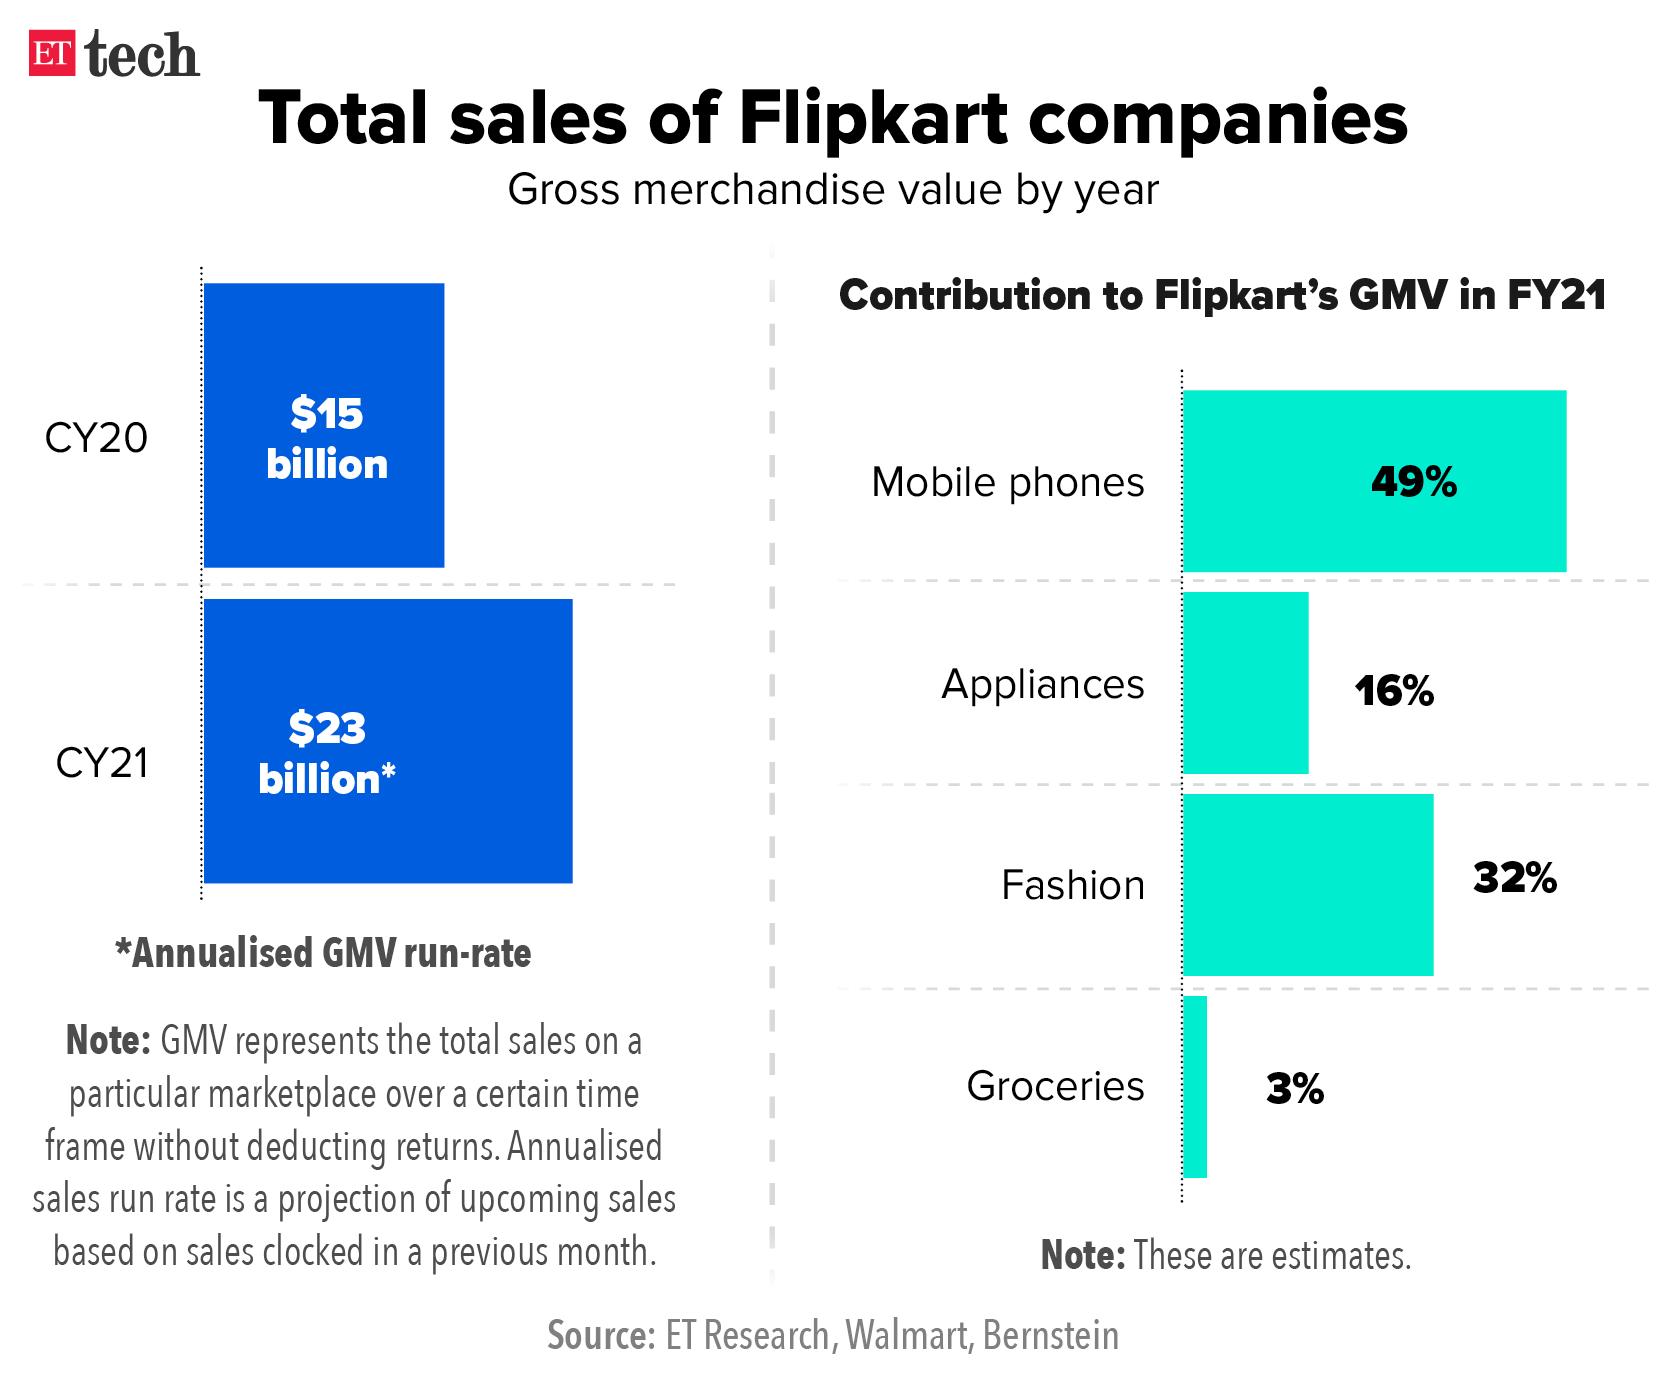 Total sales of Flipkart companies